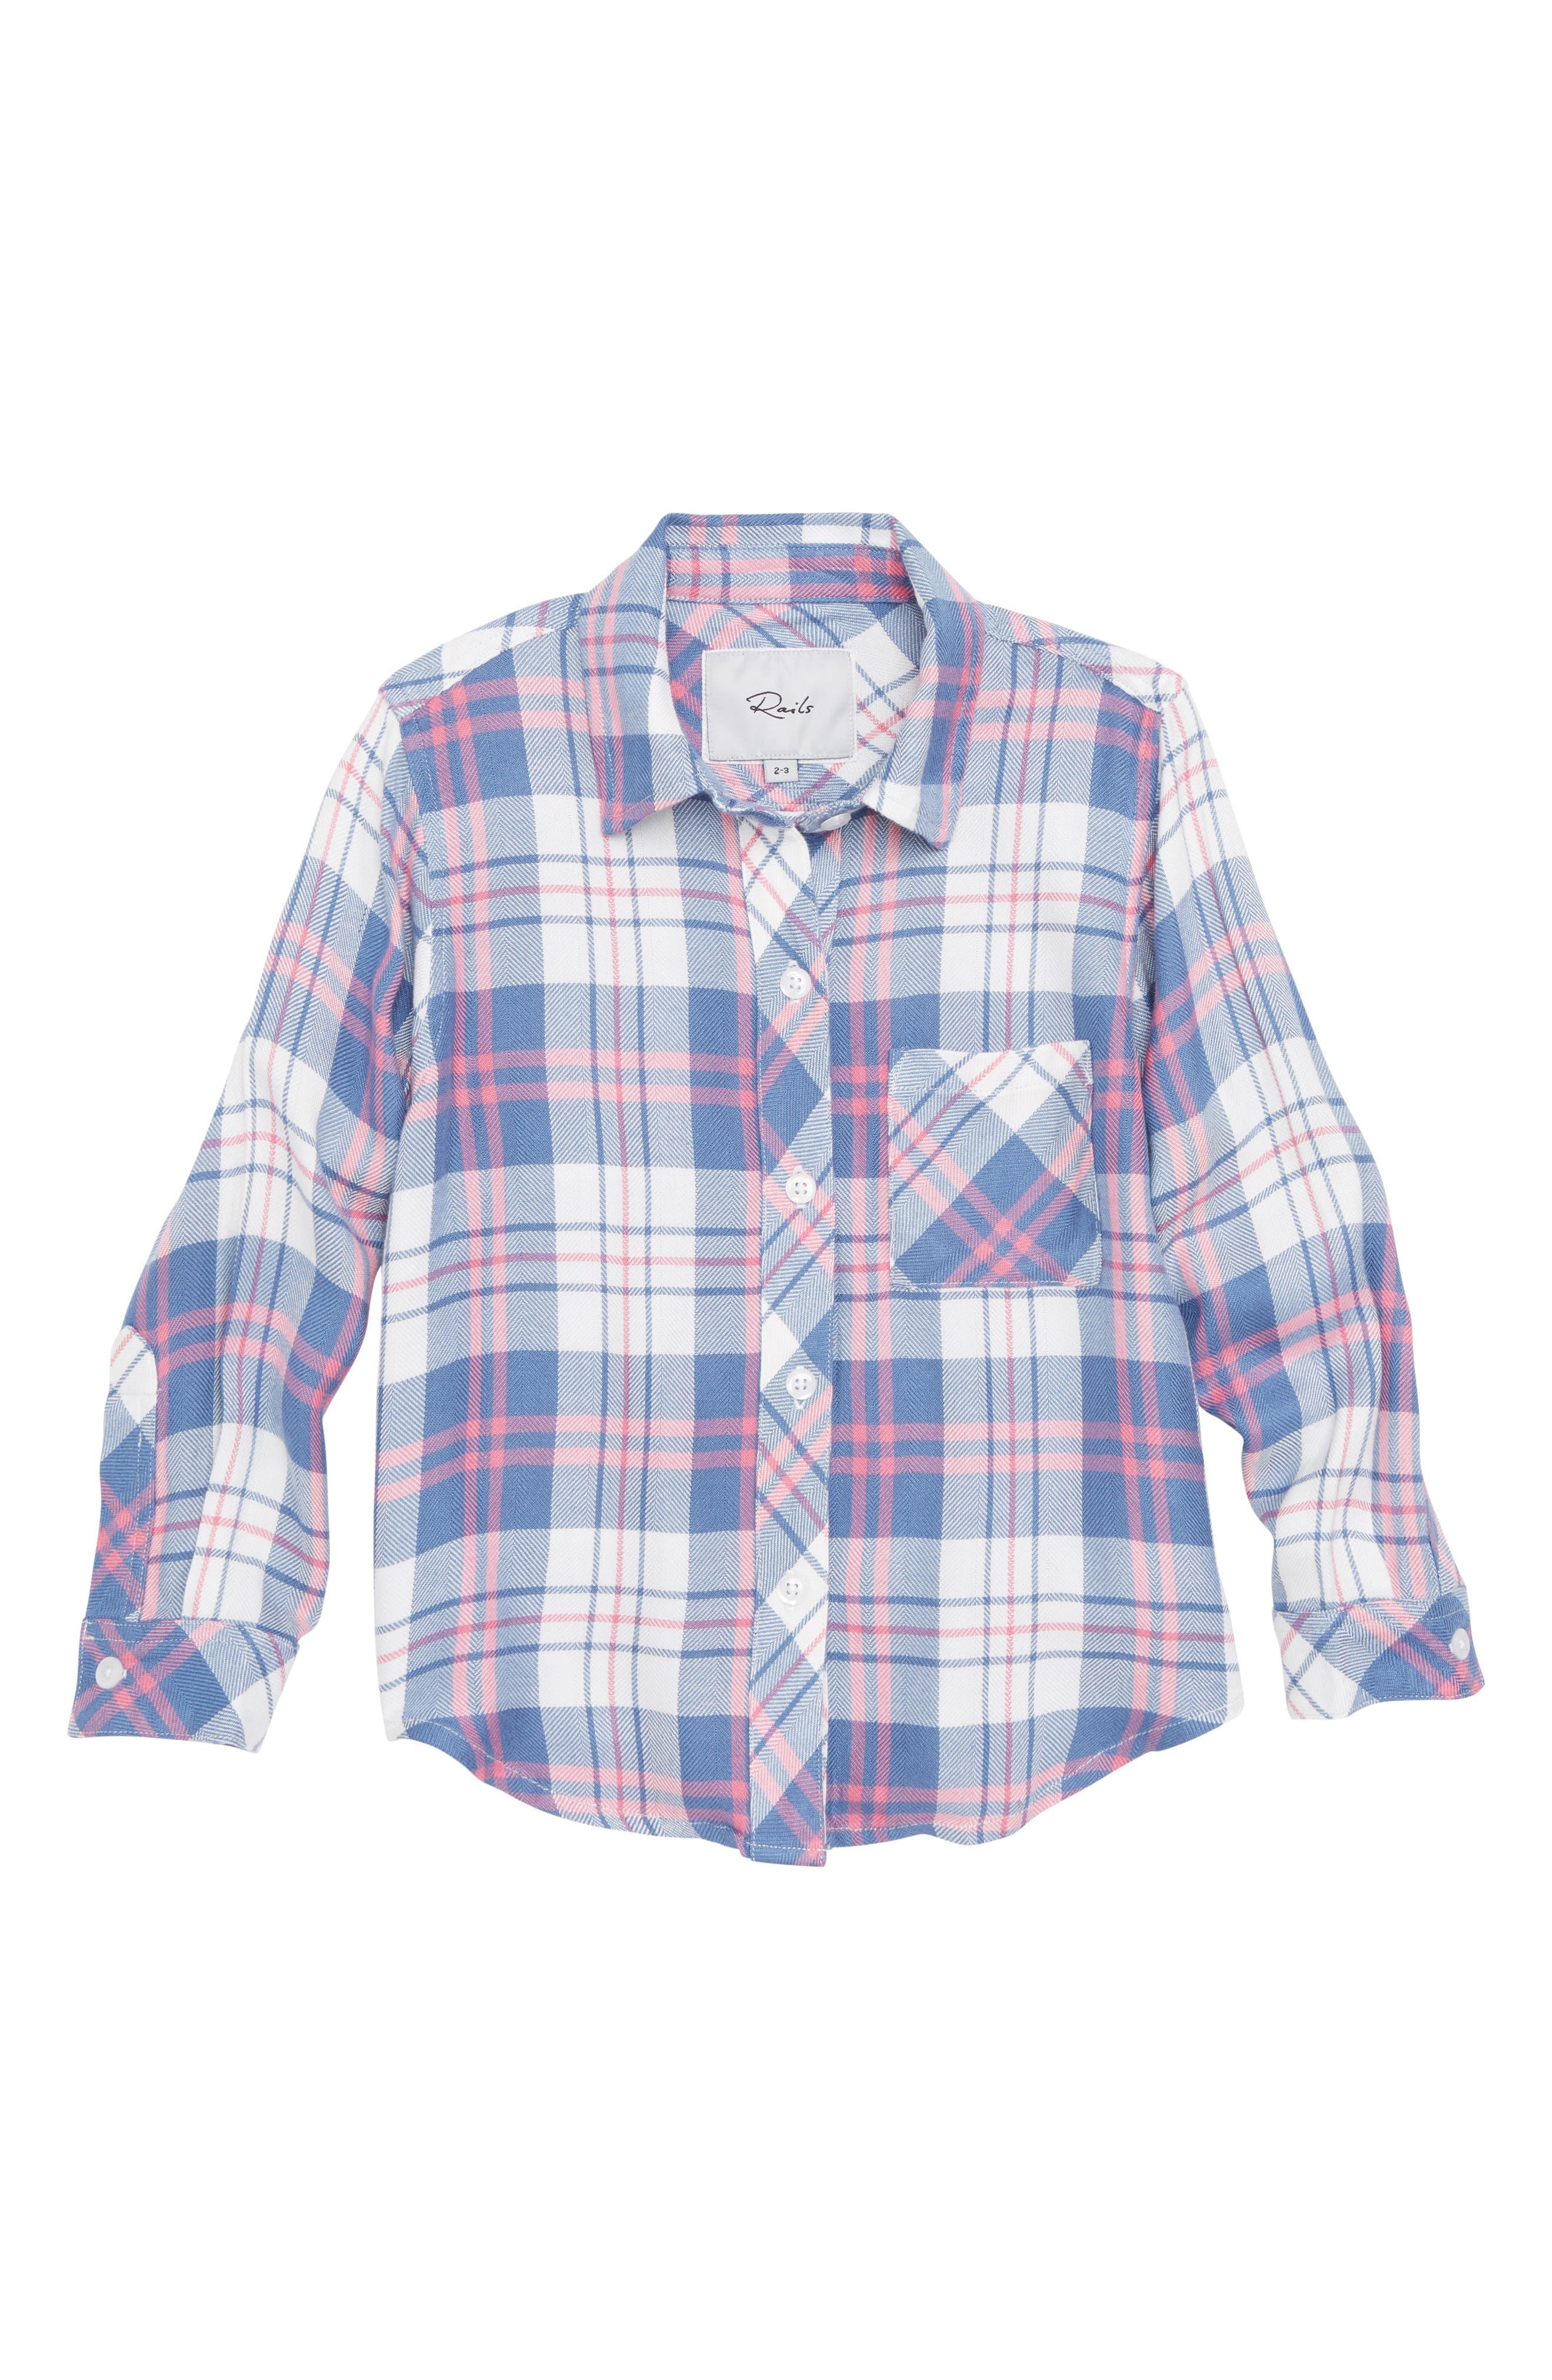 Hudson Plaid Shirt,                             Main thumbnail 1, color,                             109